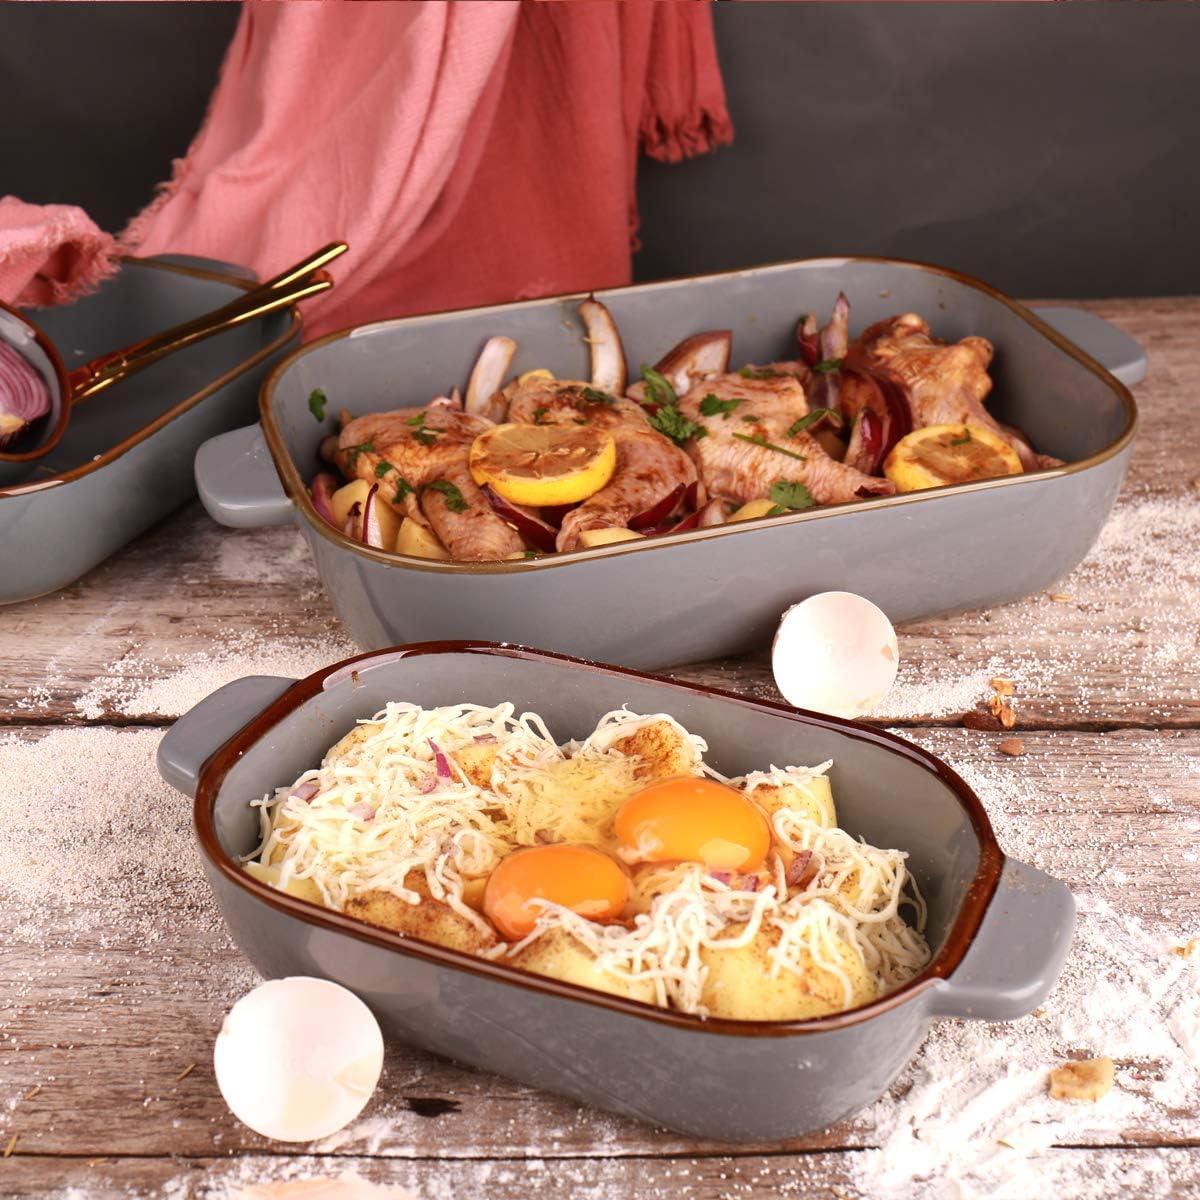 KVV Ceramic 13X9 Baking Dish Set,Kitchen,Cake Dinner,Banquet and Daily Use,Lasagna Pan,Ovenware Casserole Pan,ceramic bakeware Blue set of 3